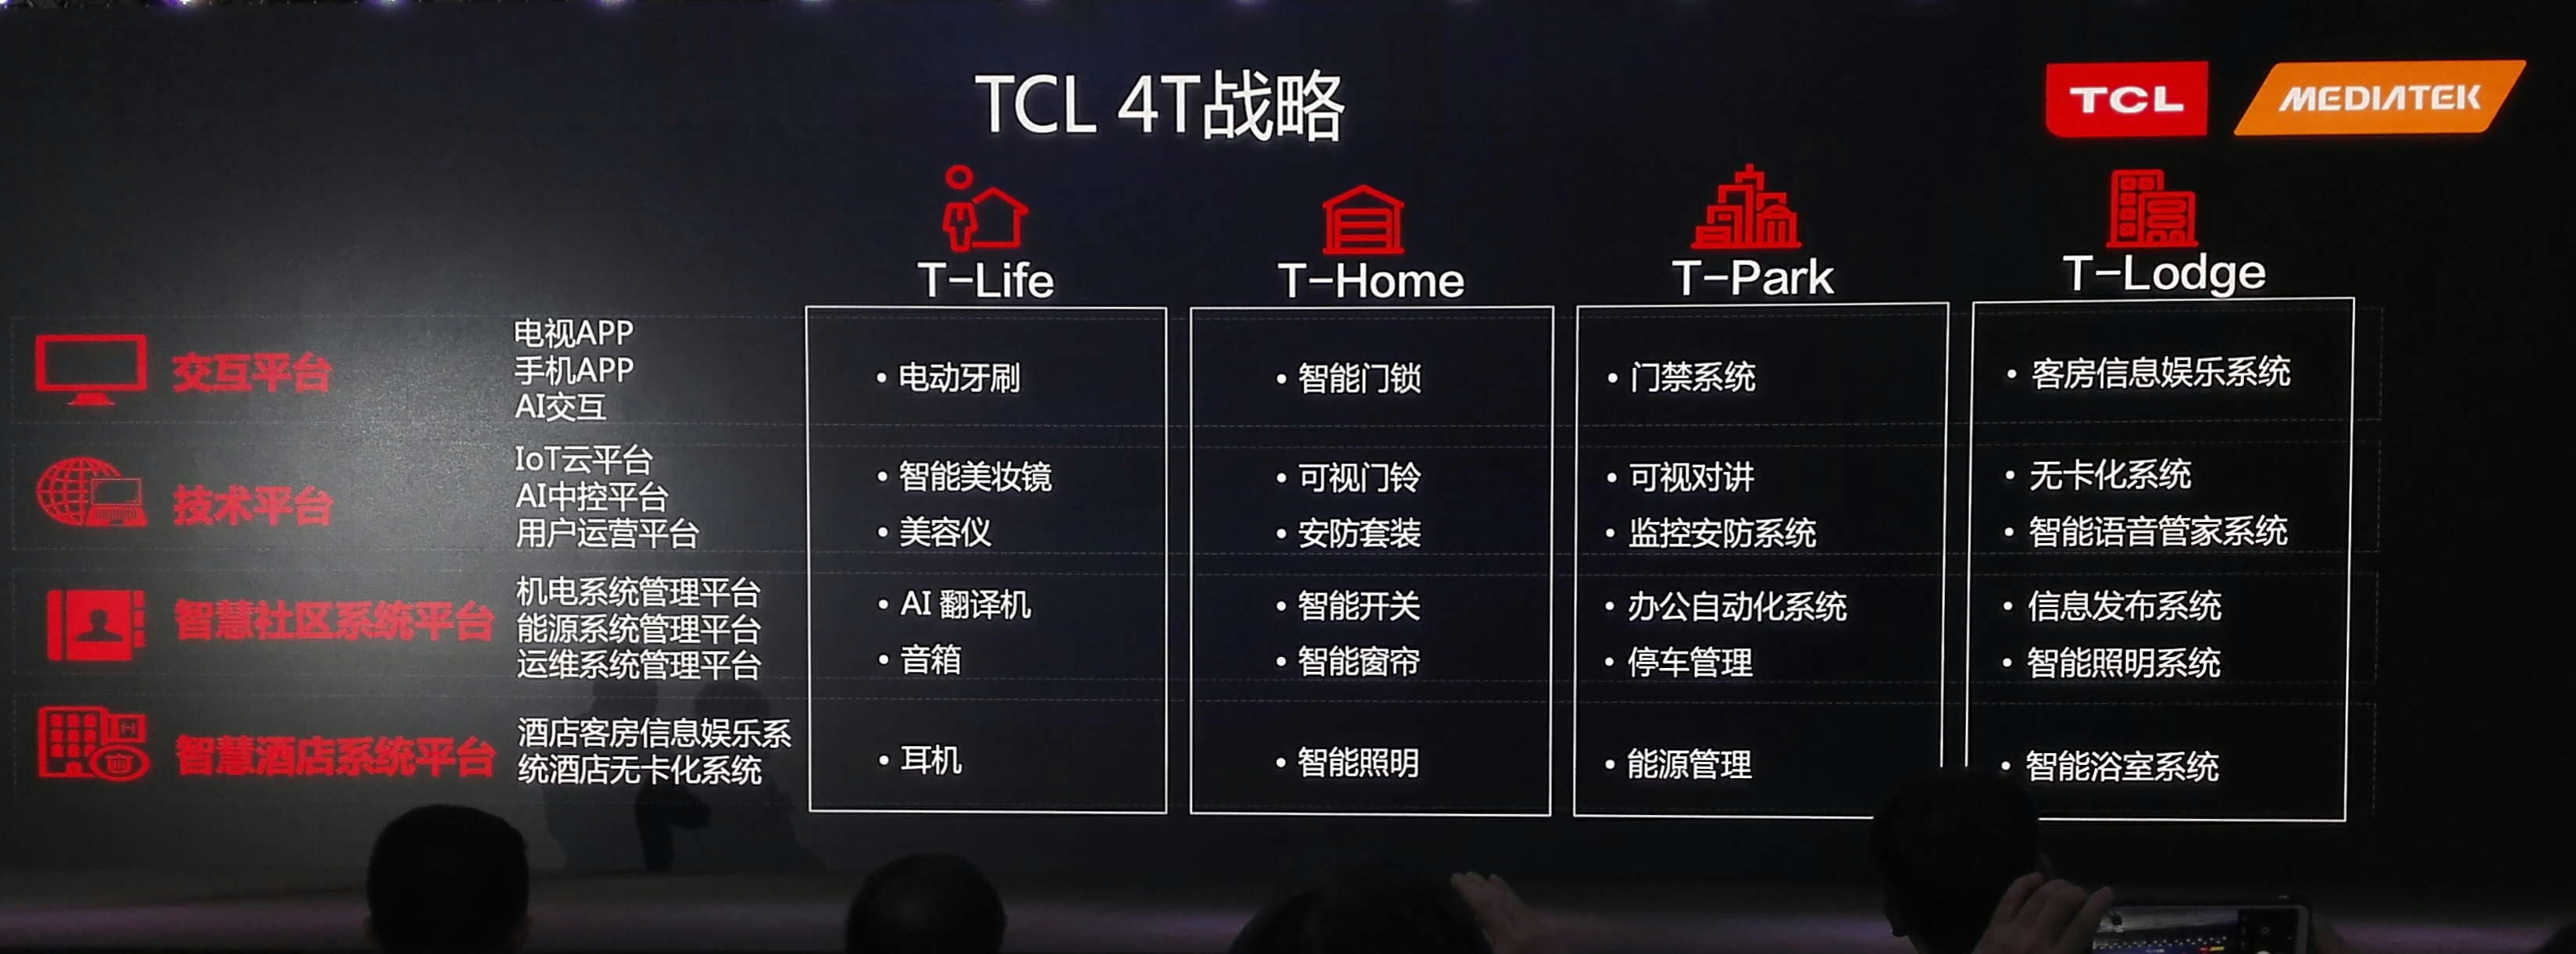 TCL的4T战略